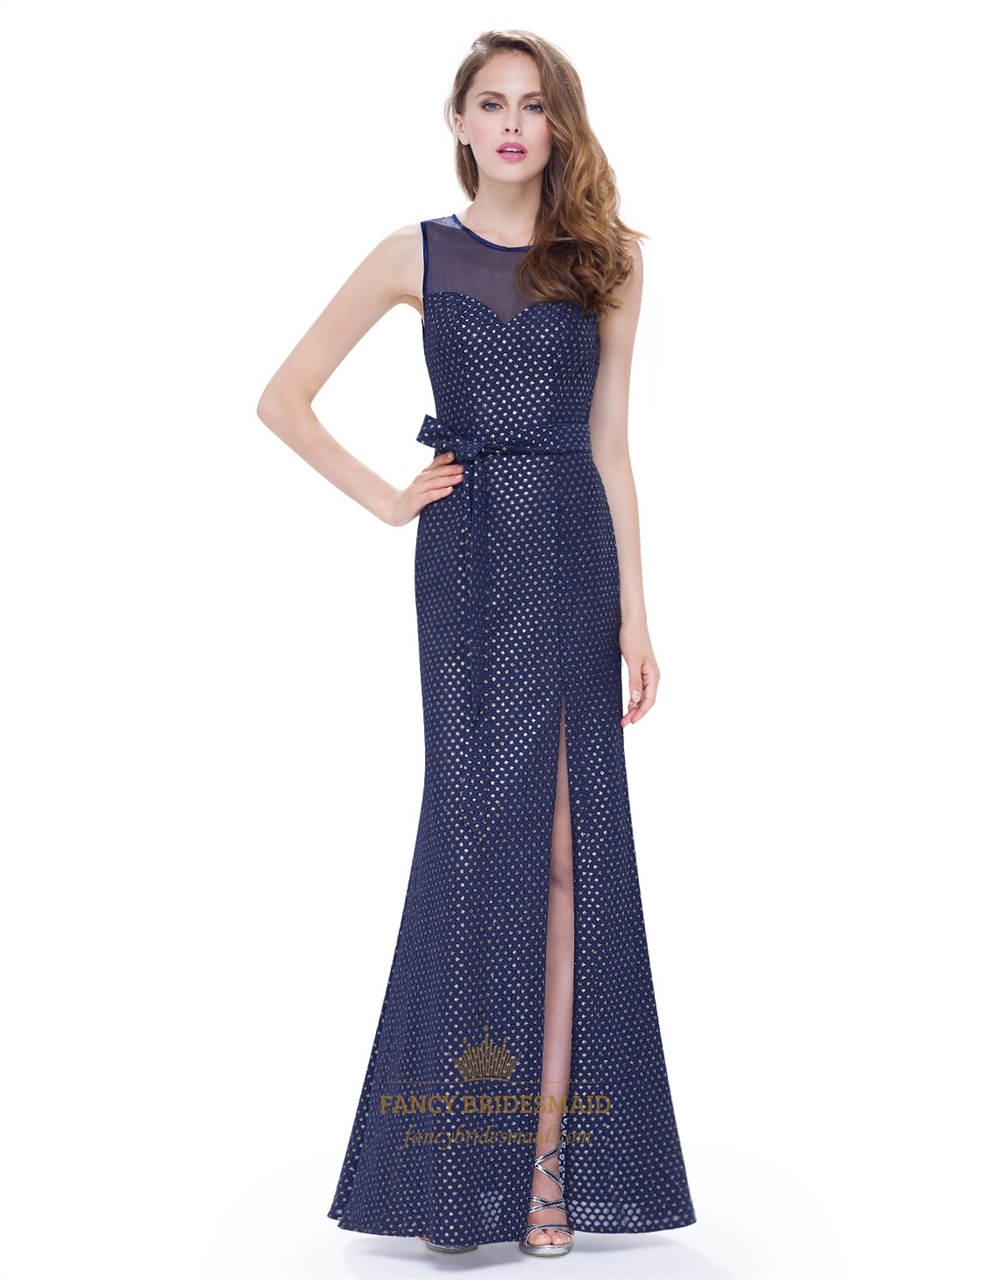 638eda01888d Navy Blue Polka Dot Open Back Chiffon Prom Dress With Side Cut Out SKU -X085